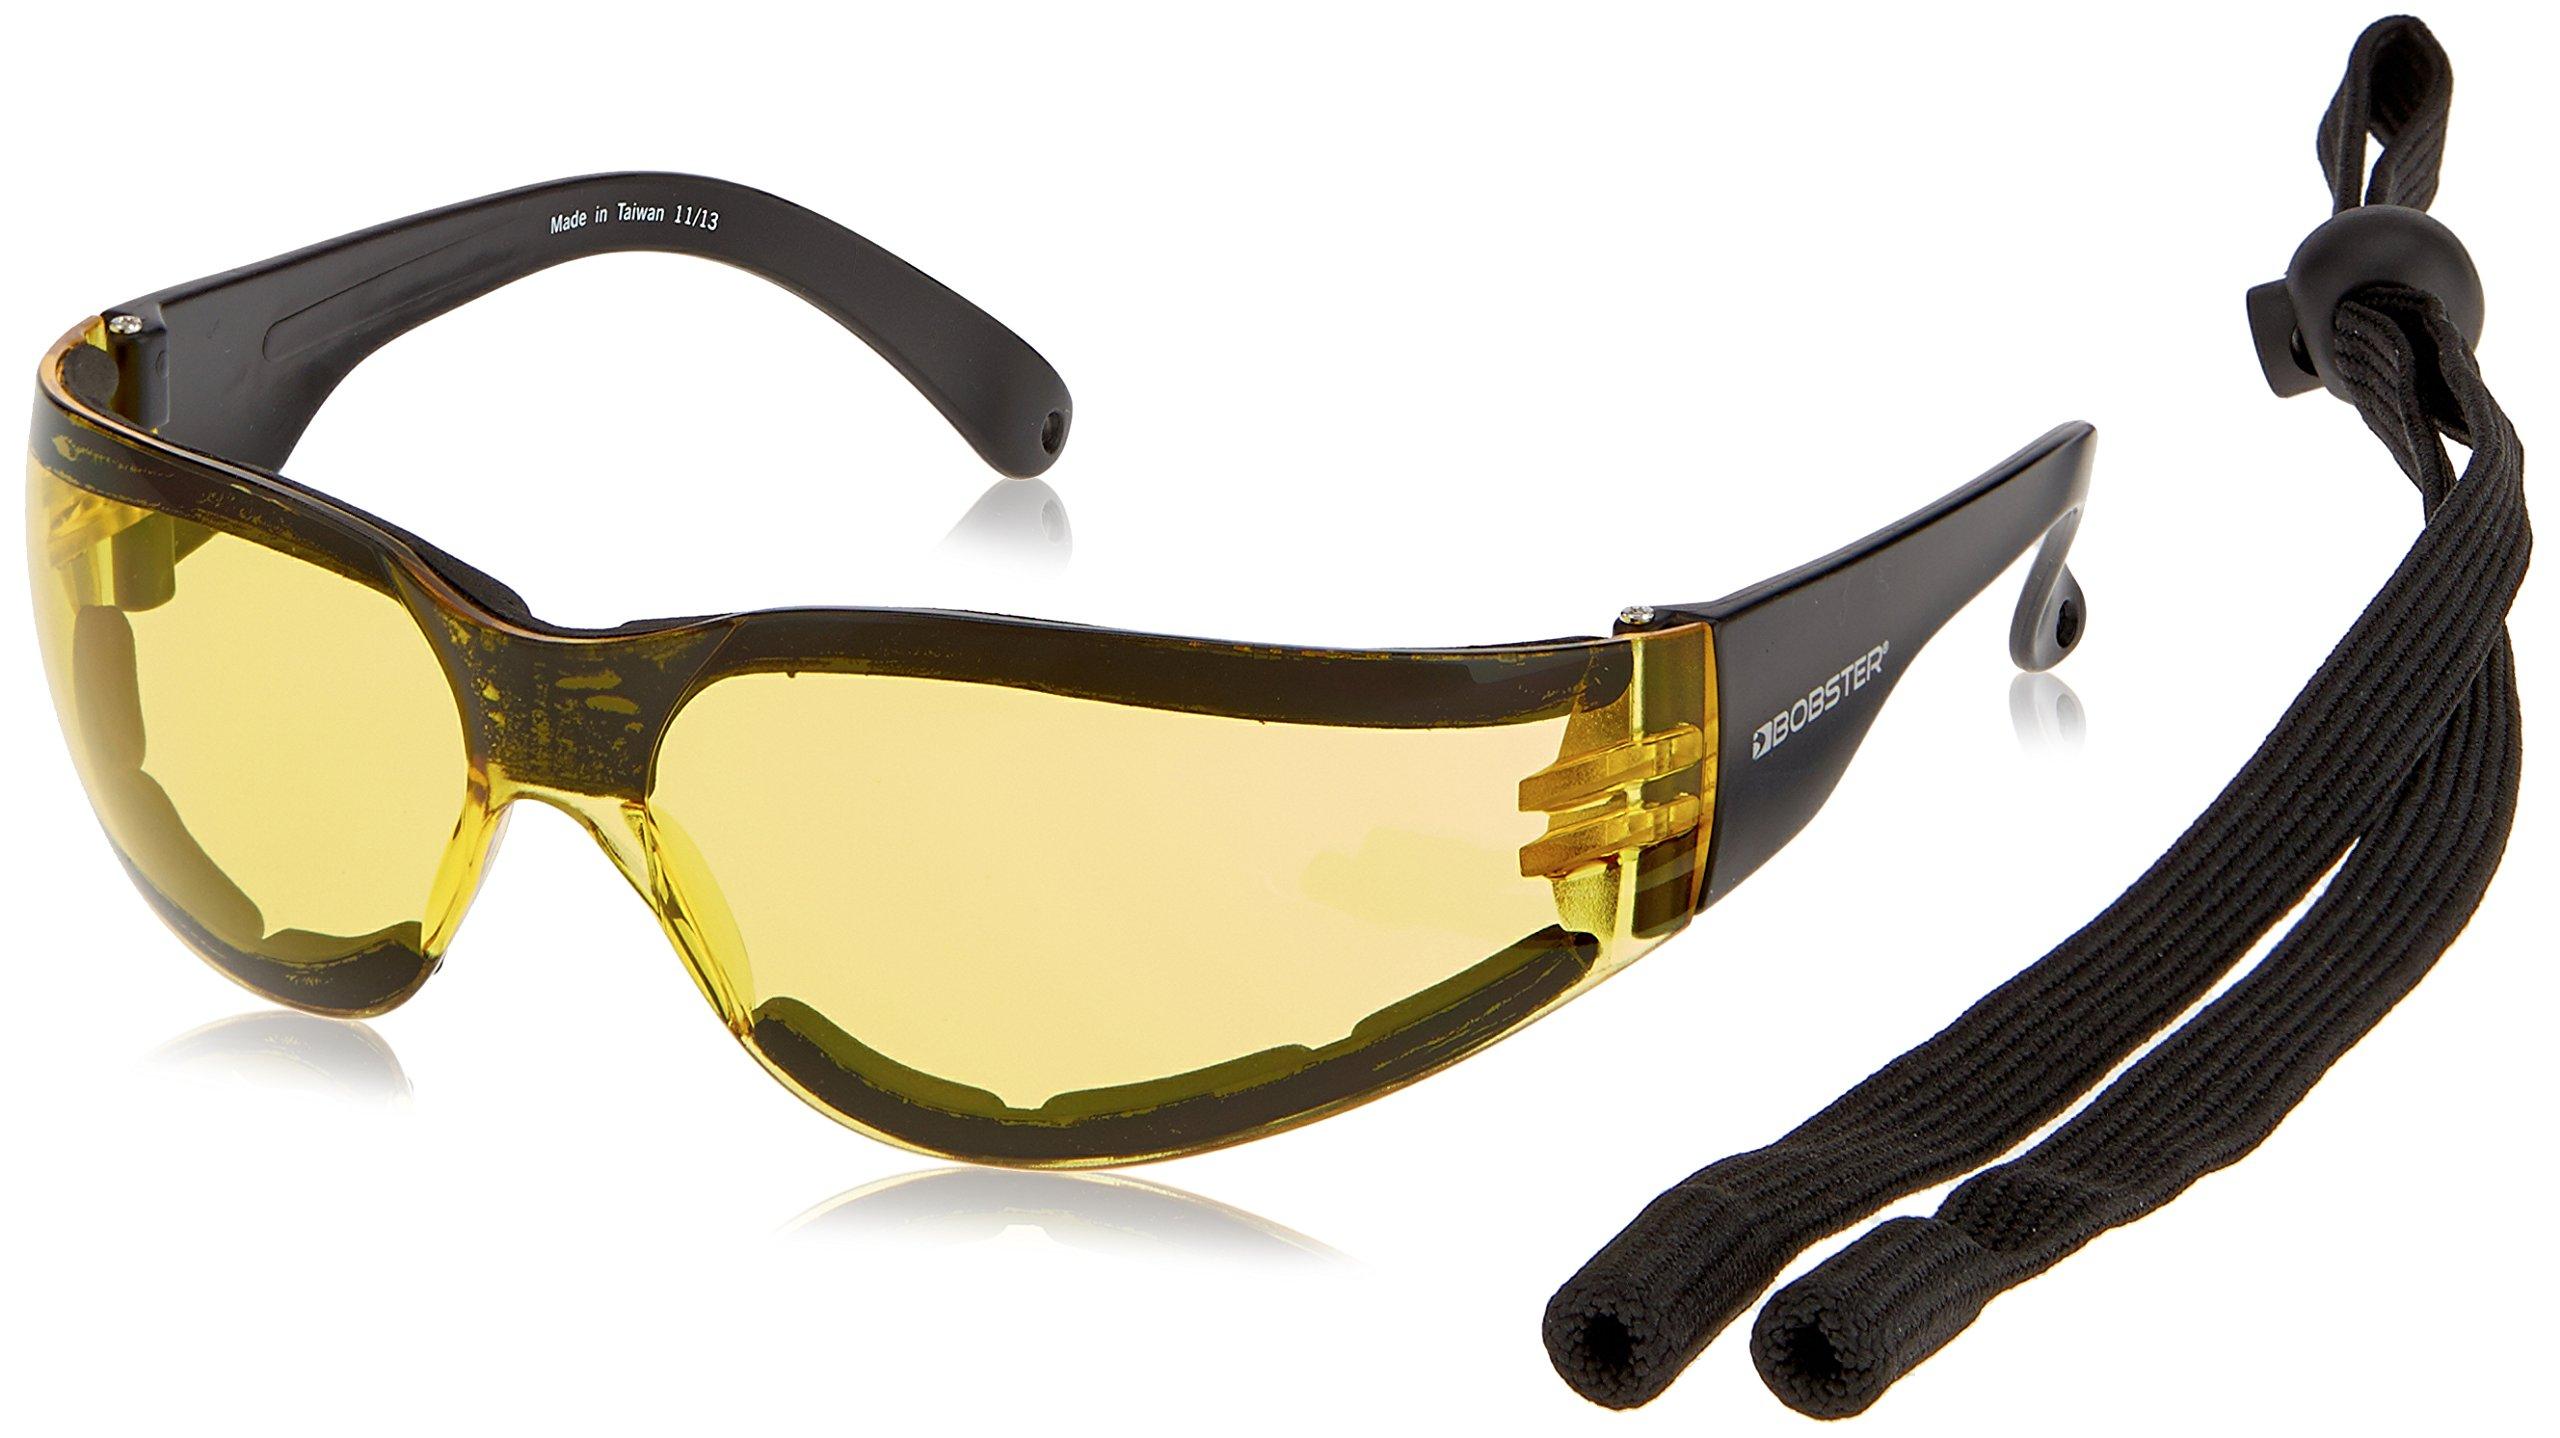 Bobster ESH303 Shield 3 Sunglasses, Black Frame/Anti-fog Yellow Lens